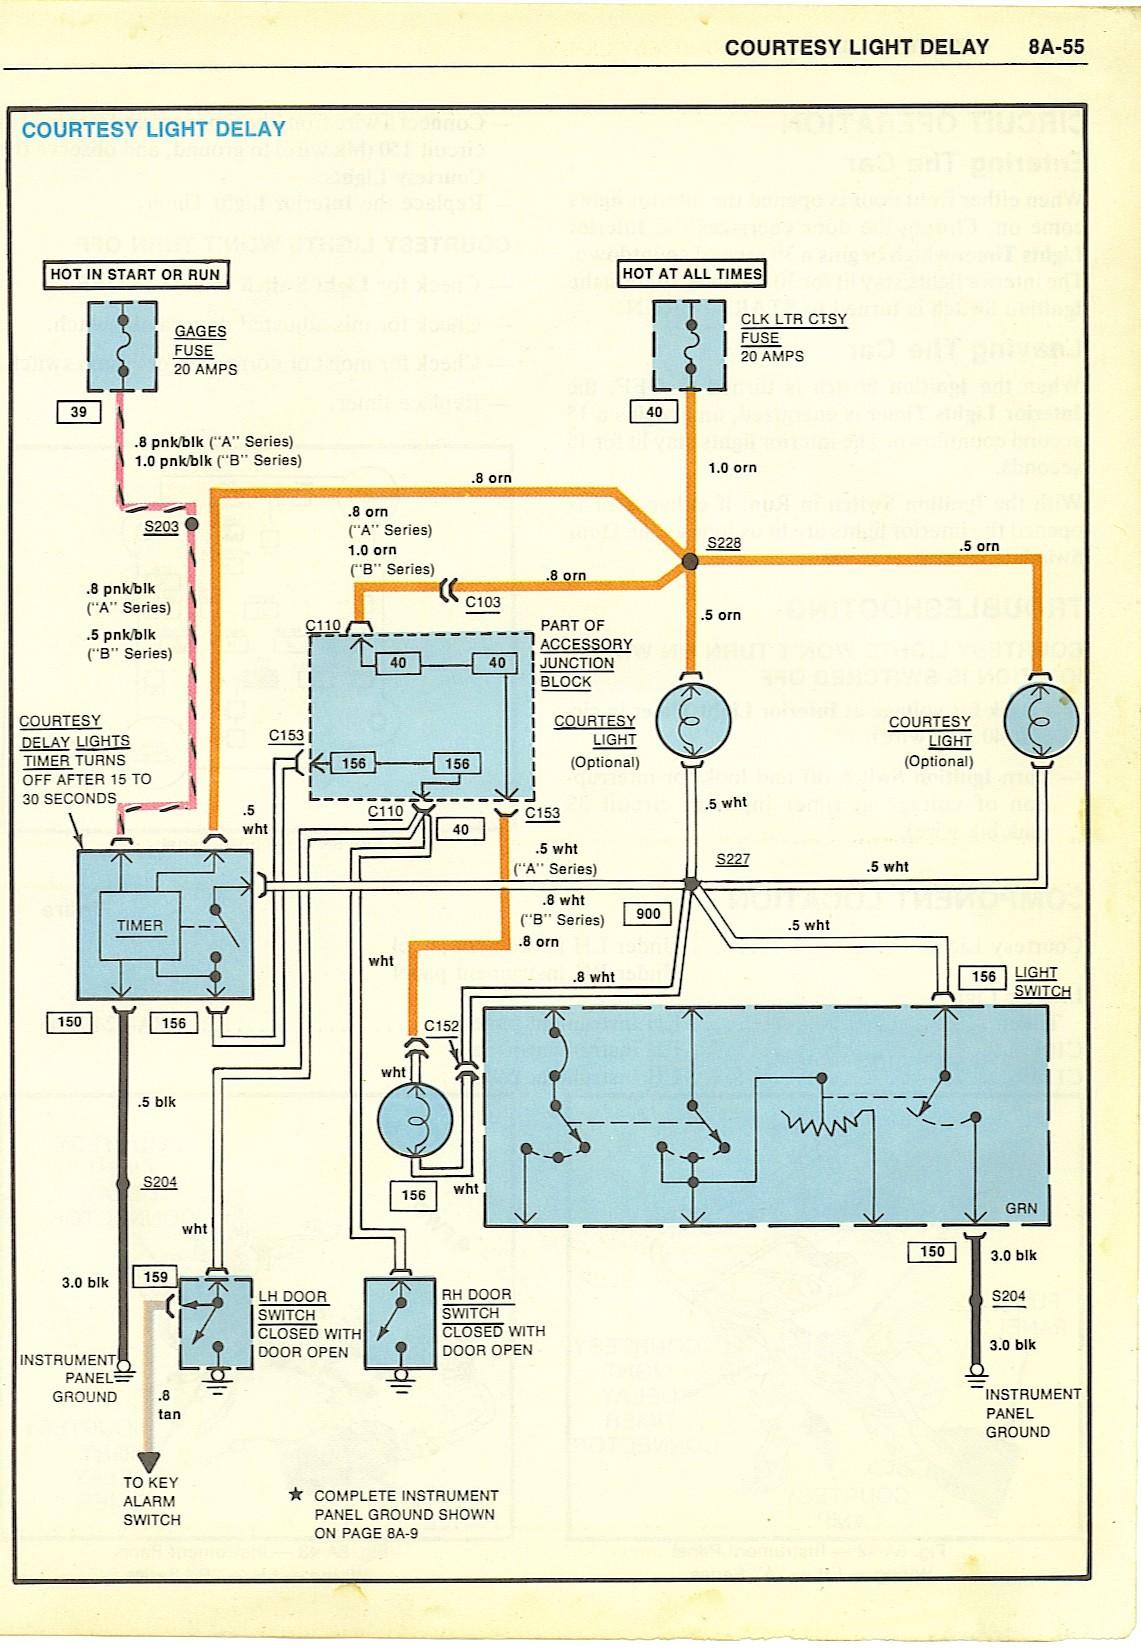 Kenworth Hvac Wiring - Most Exciting Wiring Diagram on free mercury wiring diagrams, free toyota wiring diagrams, free ford wiring diagrams, free mazda wiring diagrams, free kia wiring diagrams, free subaru wiring diagrams, free john deere wiring diagrams, free kawasaki wiring diagrams, free saab wiring diagrams, free yamaha wiring diagrams, free saturn wiring diagrams, free gmc wiring diagrams, free mercedes benz wiring diagrams, free volvo wiring diagrams, free dodge wiring diagrams, free hyundai wiring diagrams, free chrysler wiring diagrams, free nissan wiring diagrams, free volkswagen wiring diagrams, free bmw wiring diagrams,